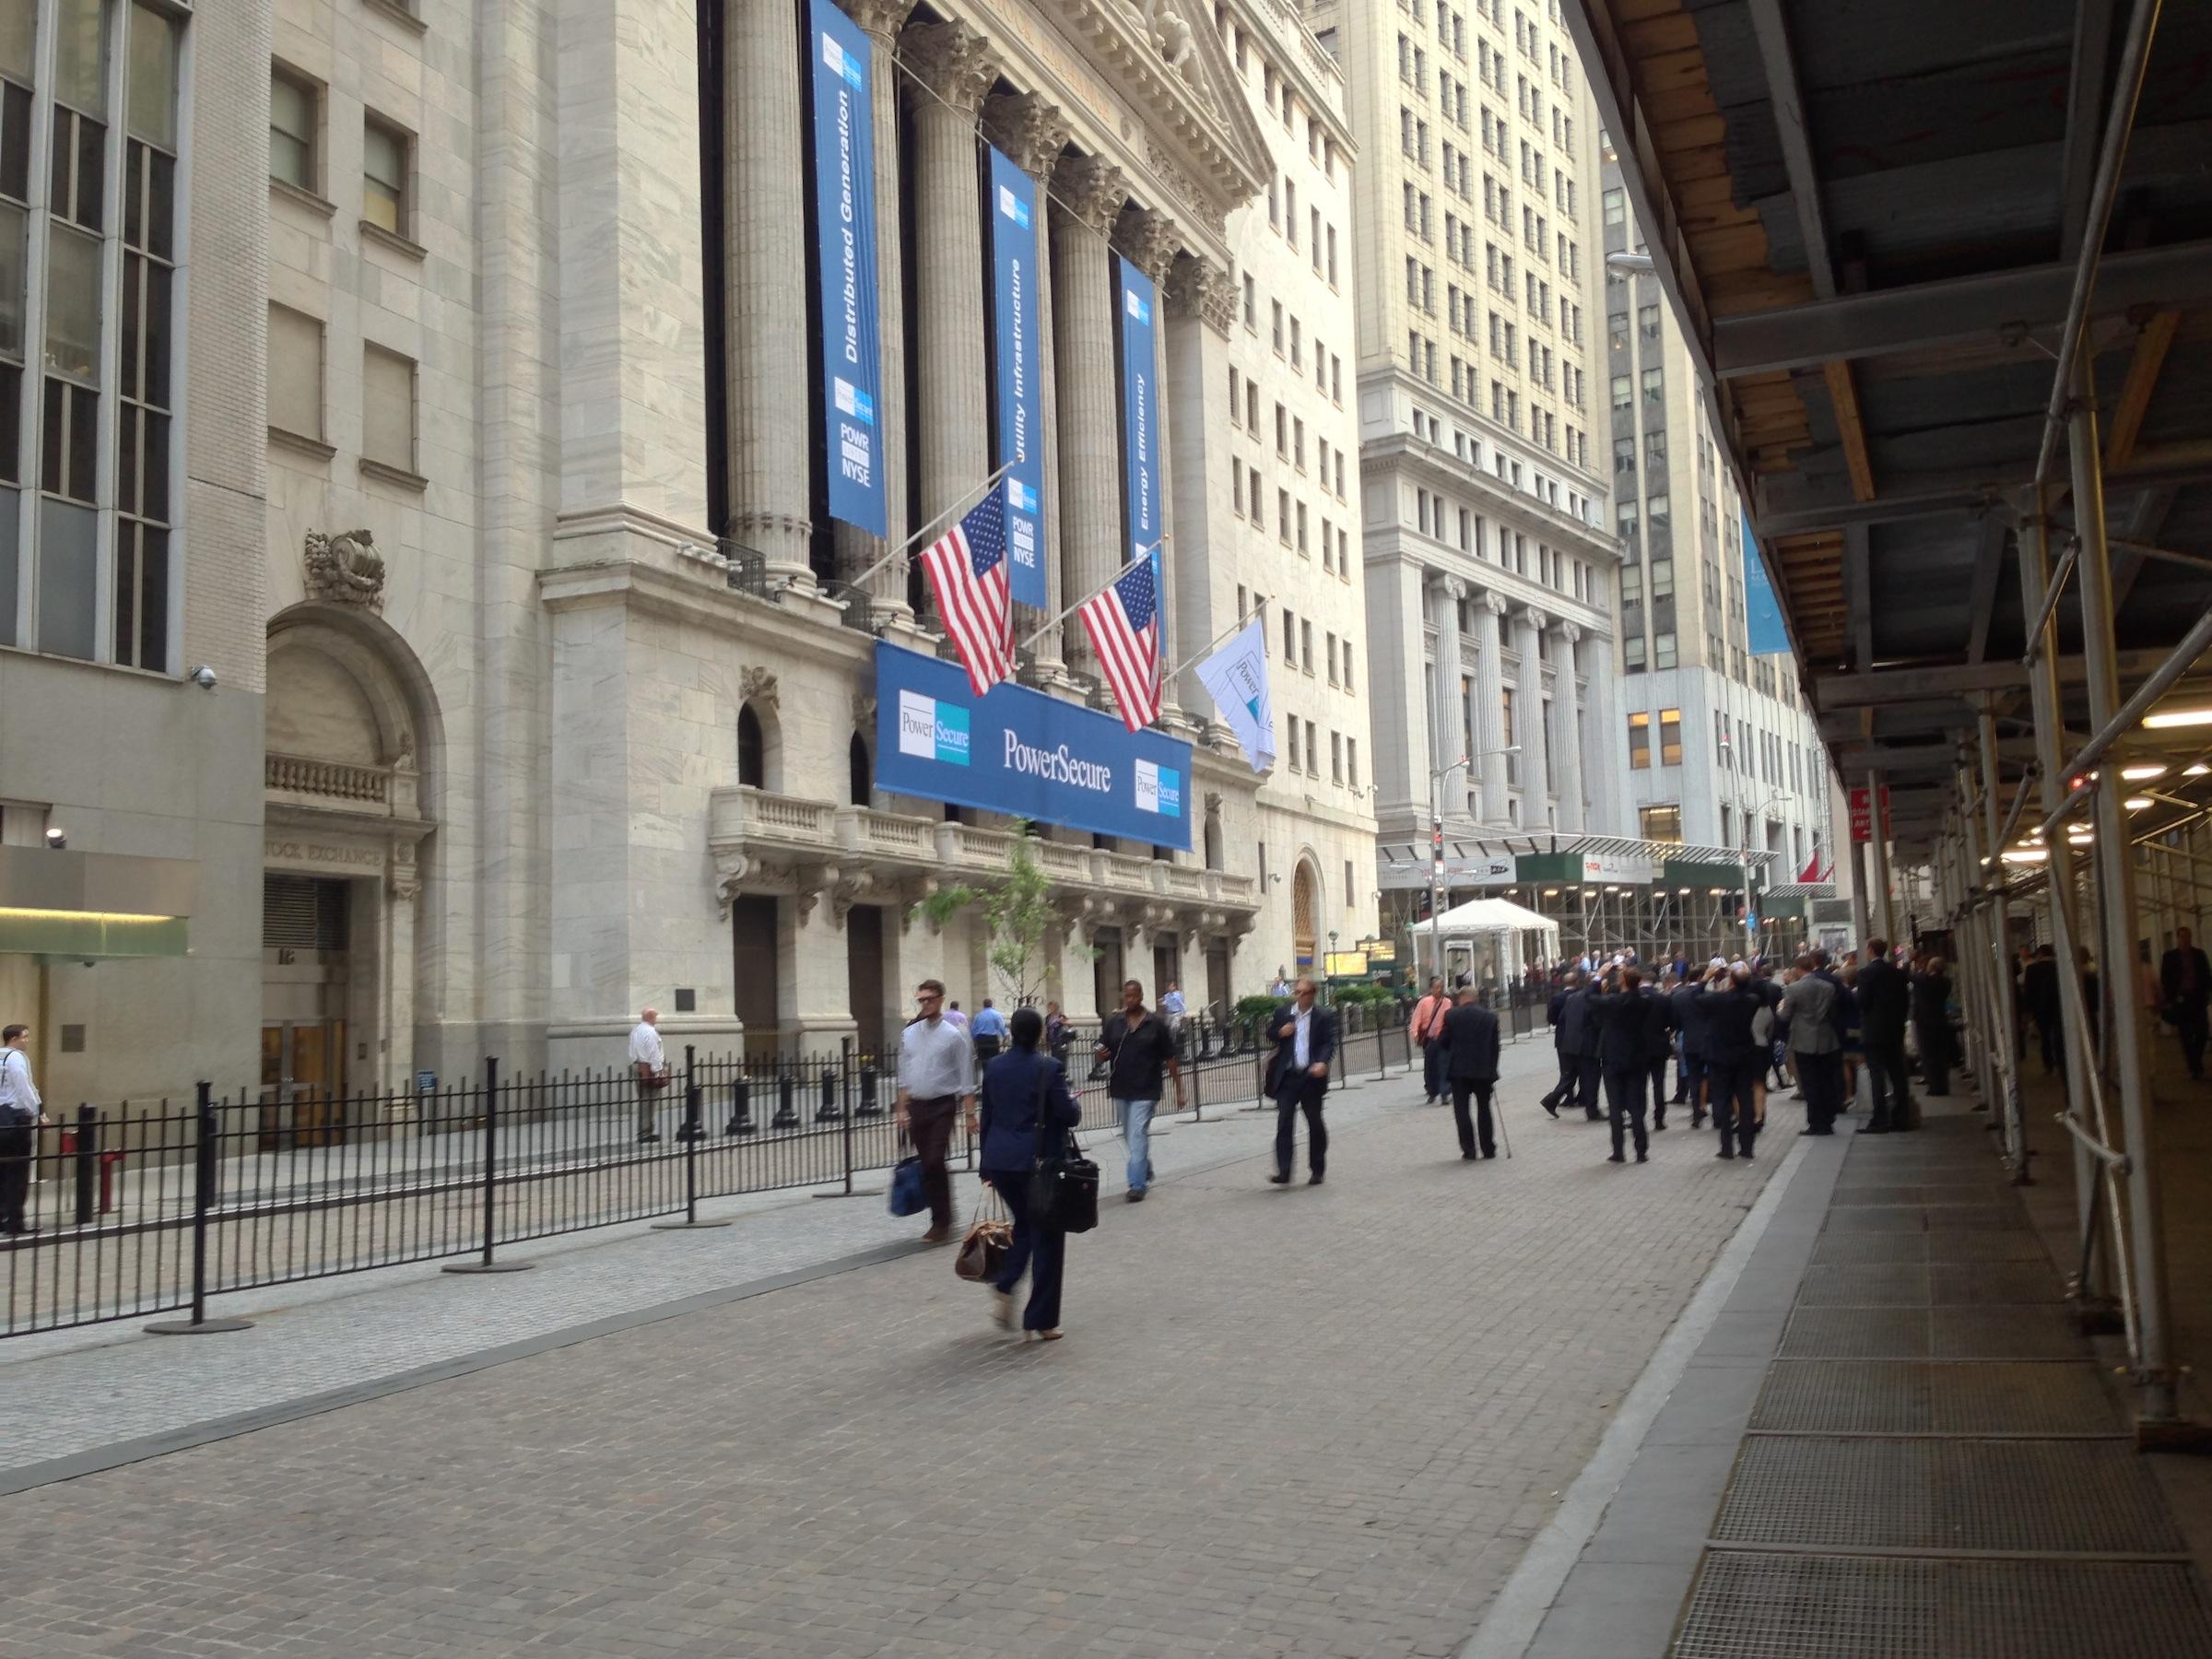 Power Secure Wall Street